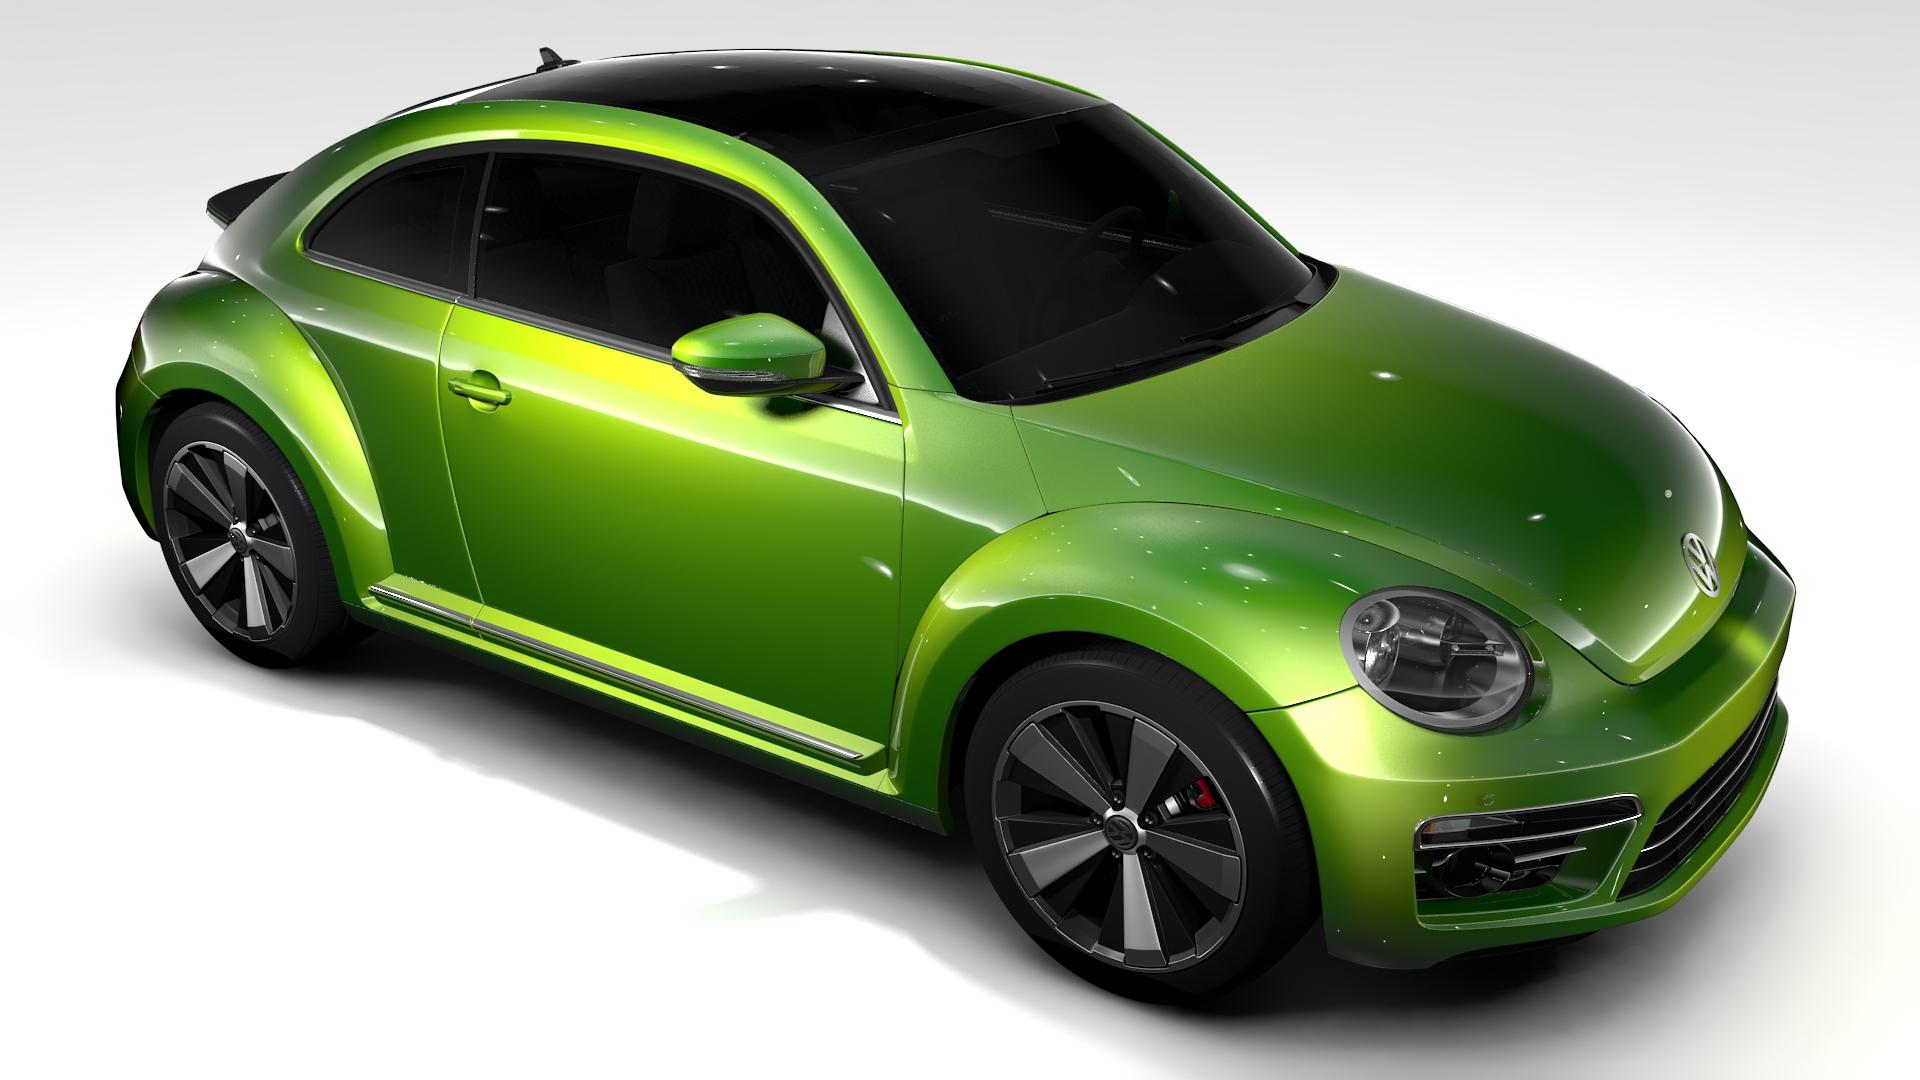 vw beetle 2017 3d model 3ds max fbx c4d lwo ma mb hrc xsi obj 221574